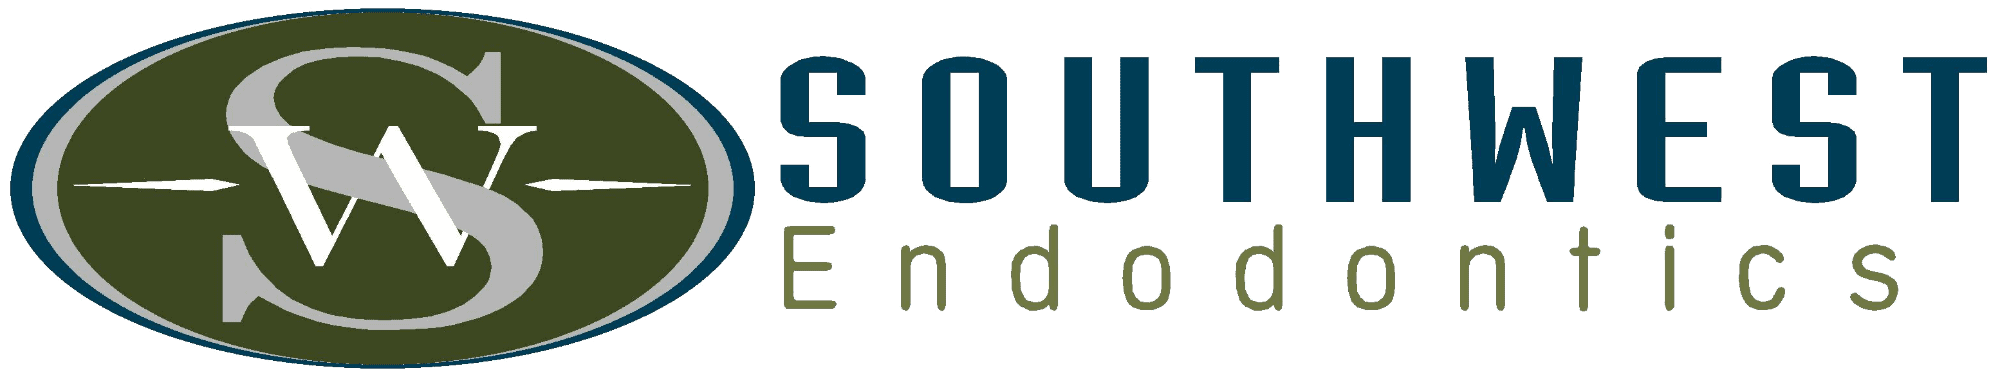 houston endodontics